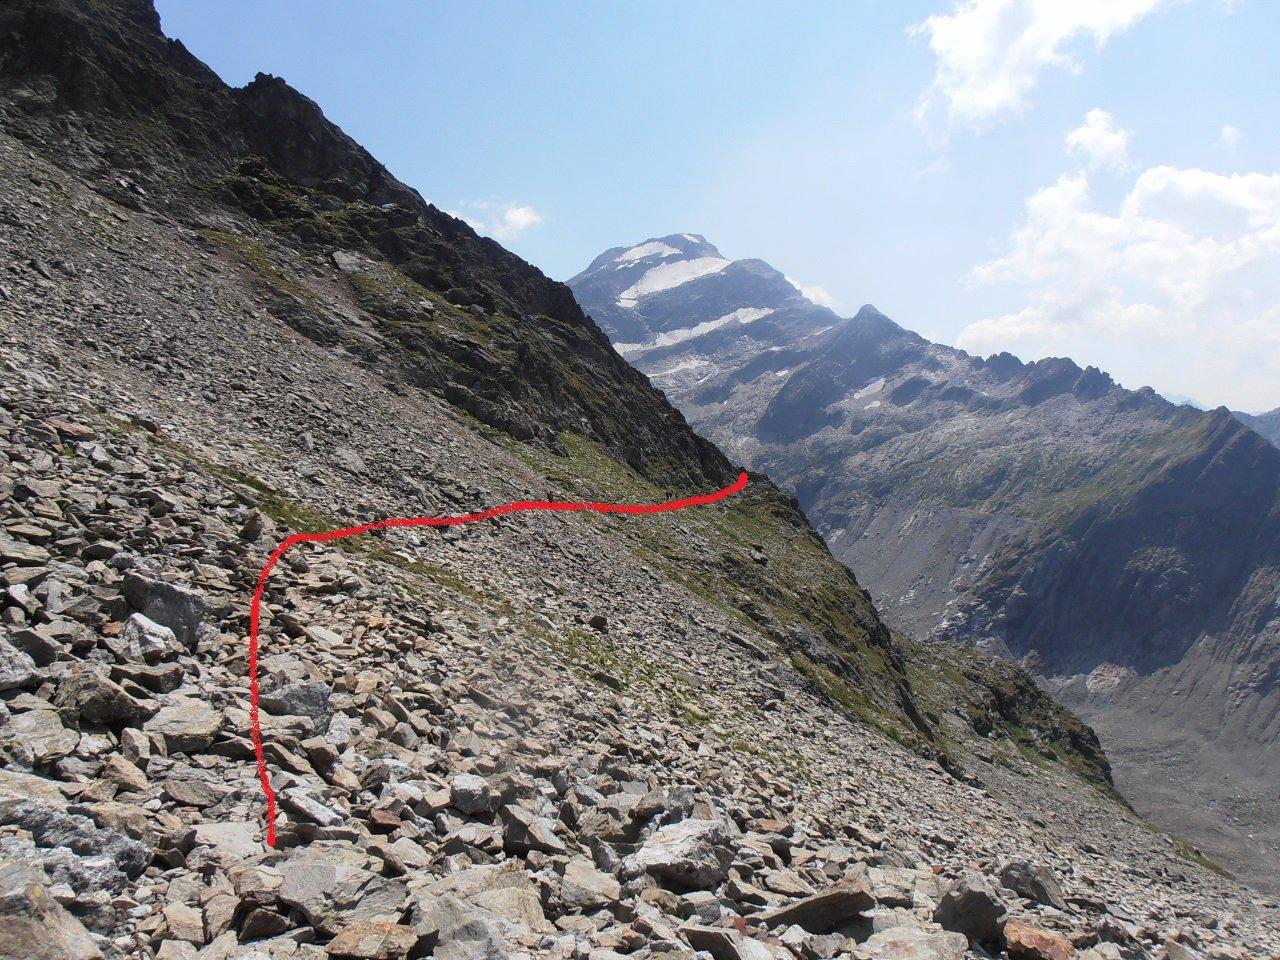 08 - sentiero nelle pietraie